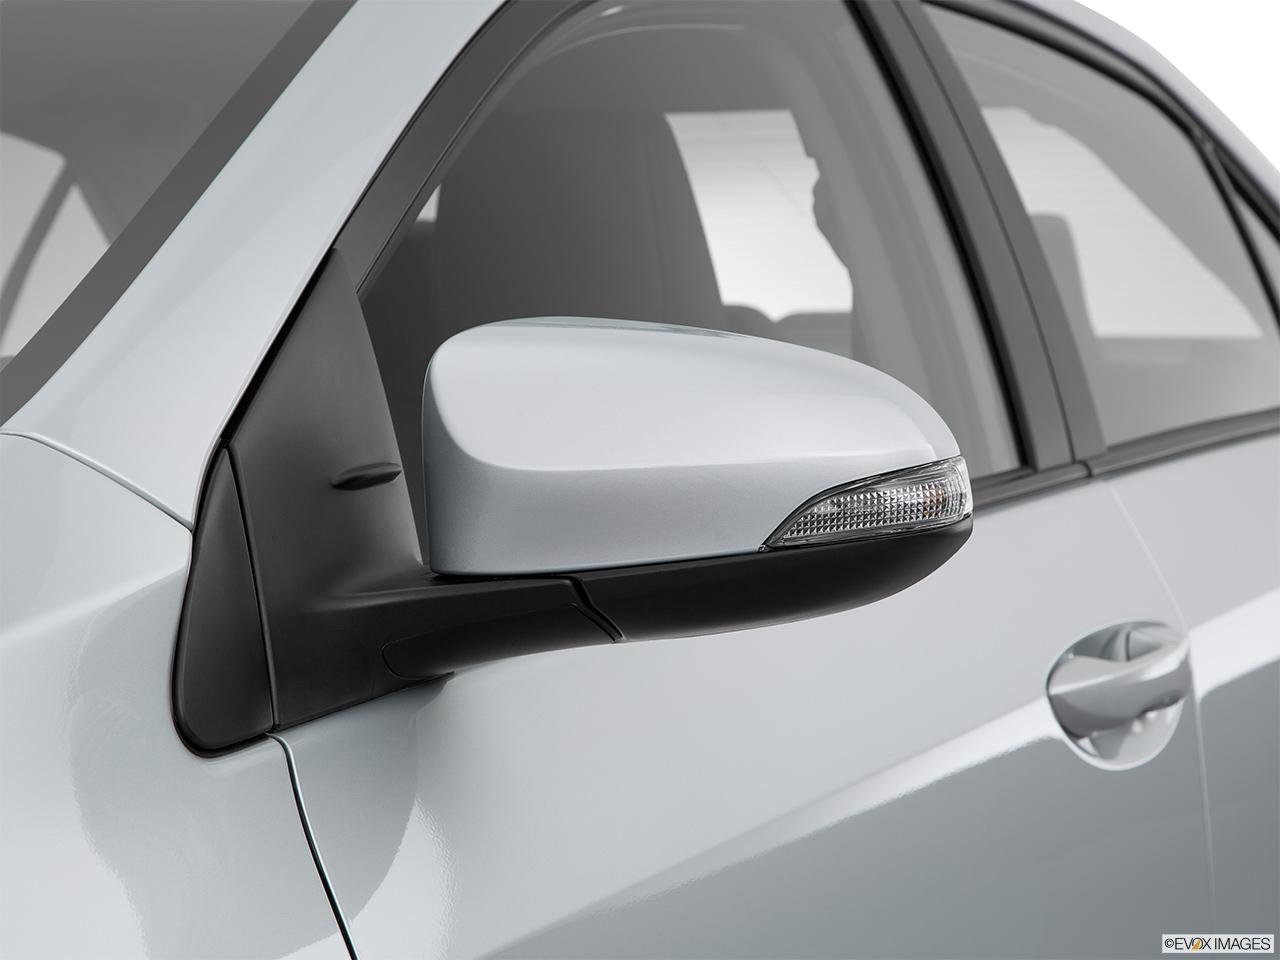 2015 Toyota Corolla 4dr Sedan Cvt S Front Angle View 2015 Toyota